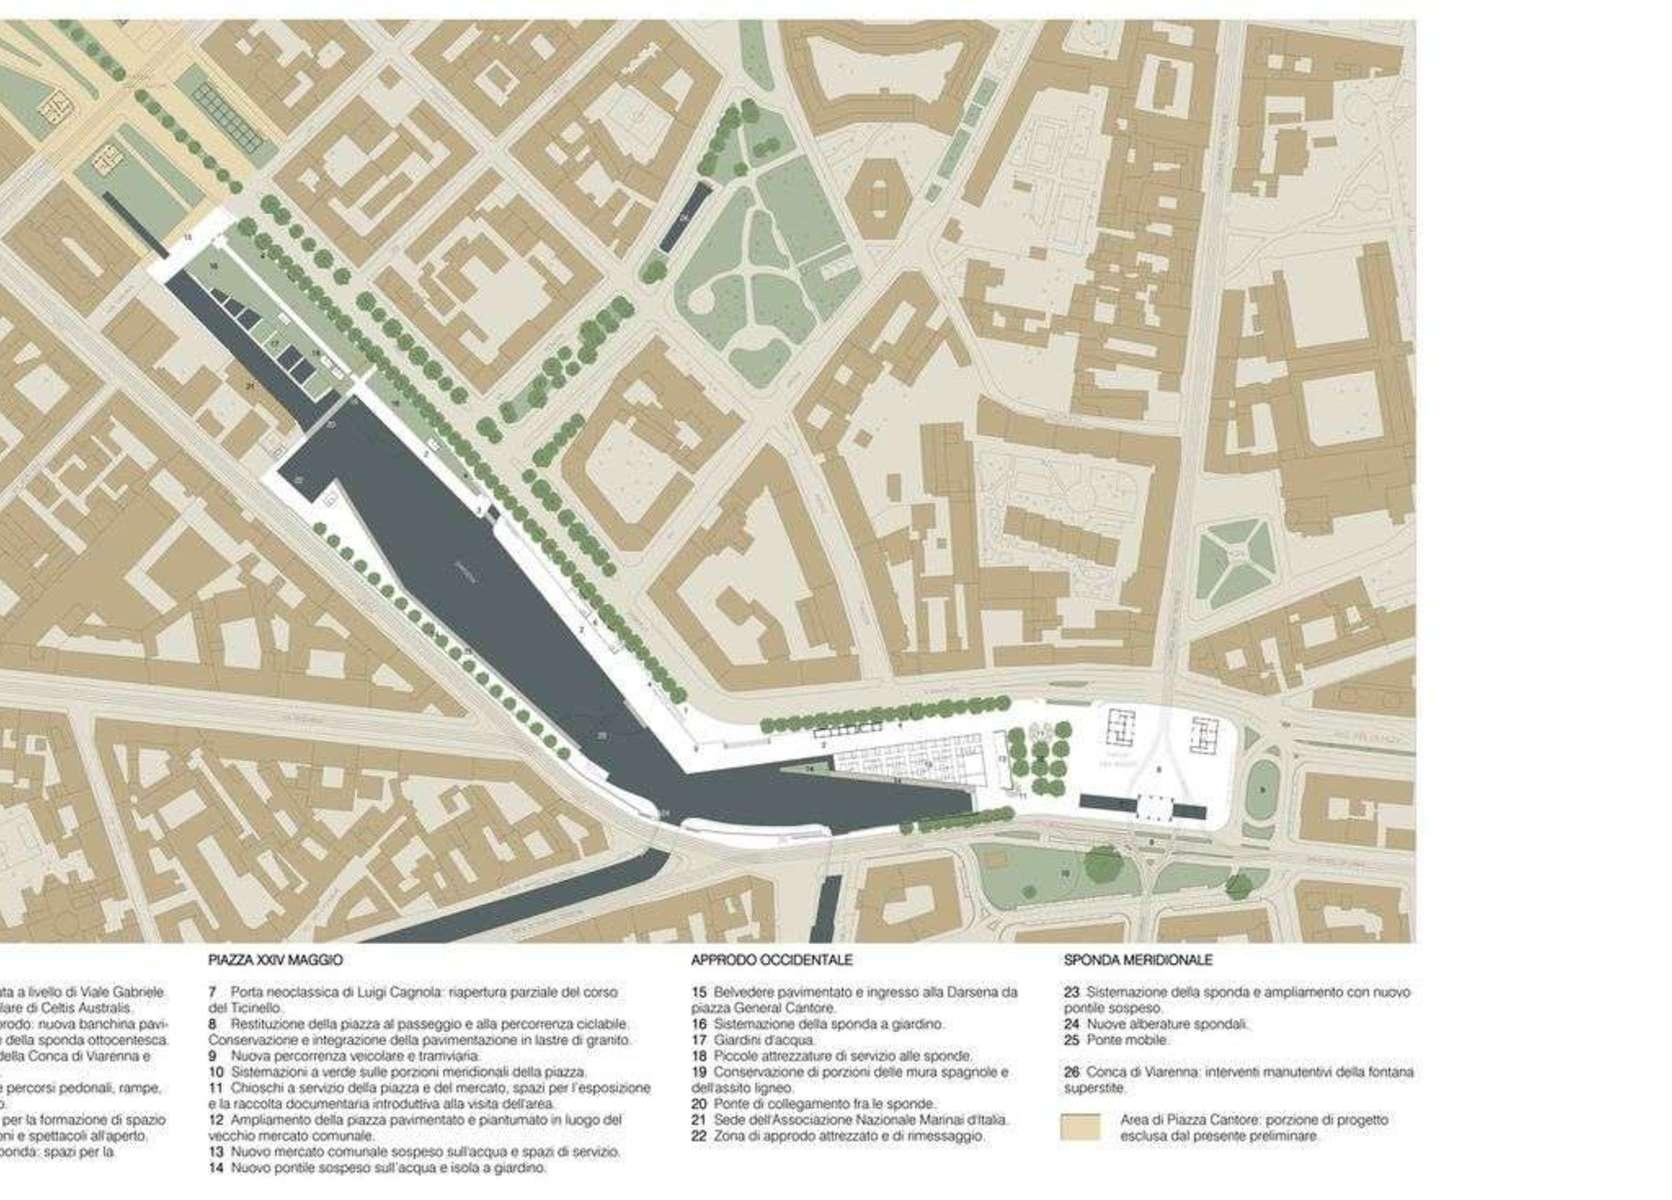 Milan et l'Expo : requalification de la Darsena